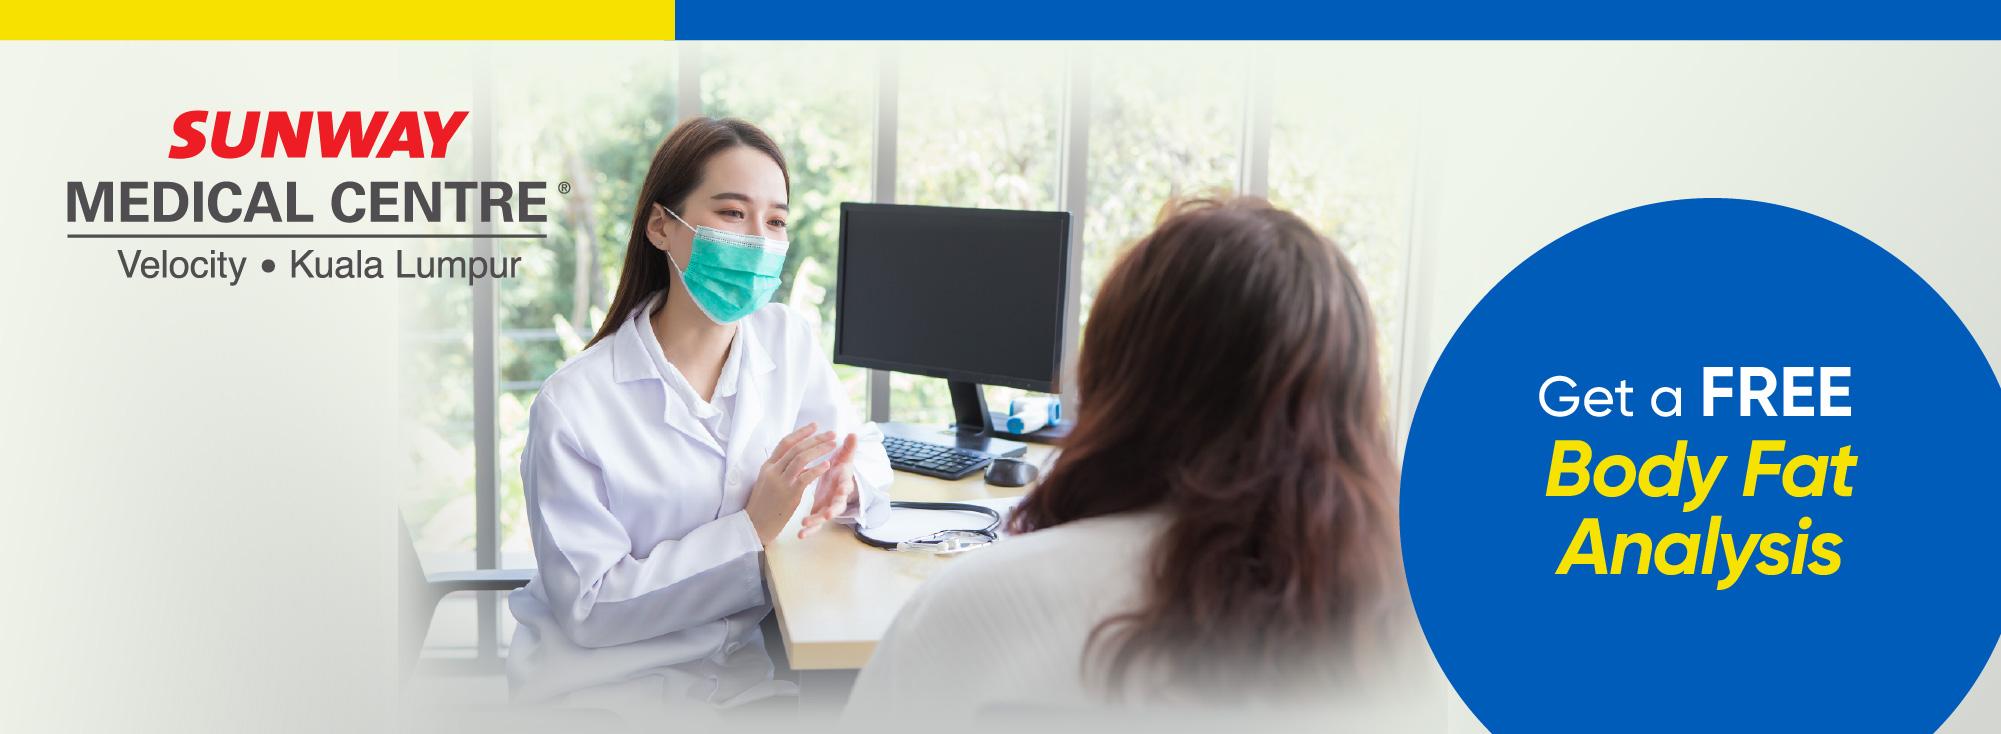 Sunway Medical Centre, Velocity July Promotion